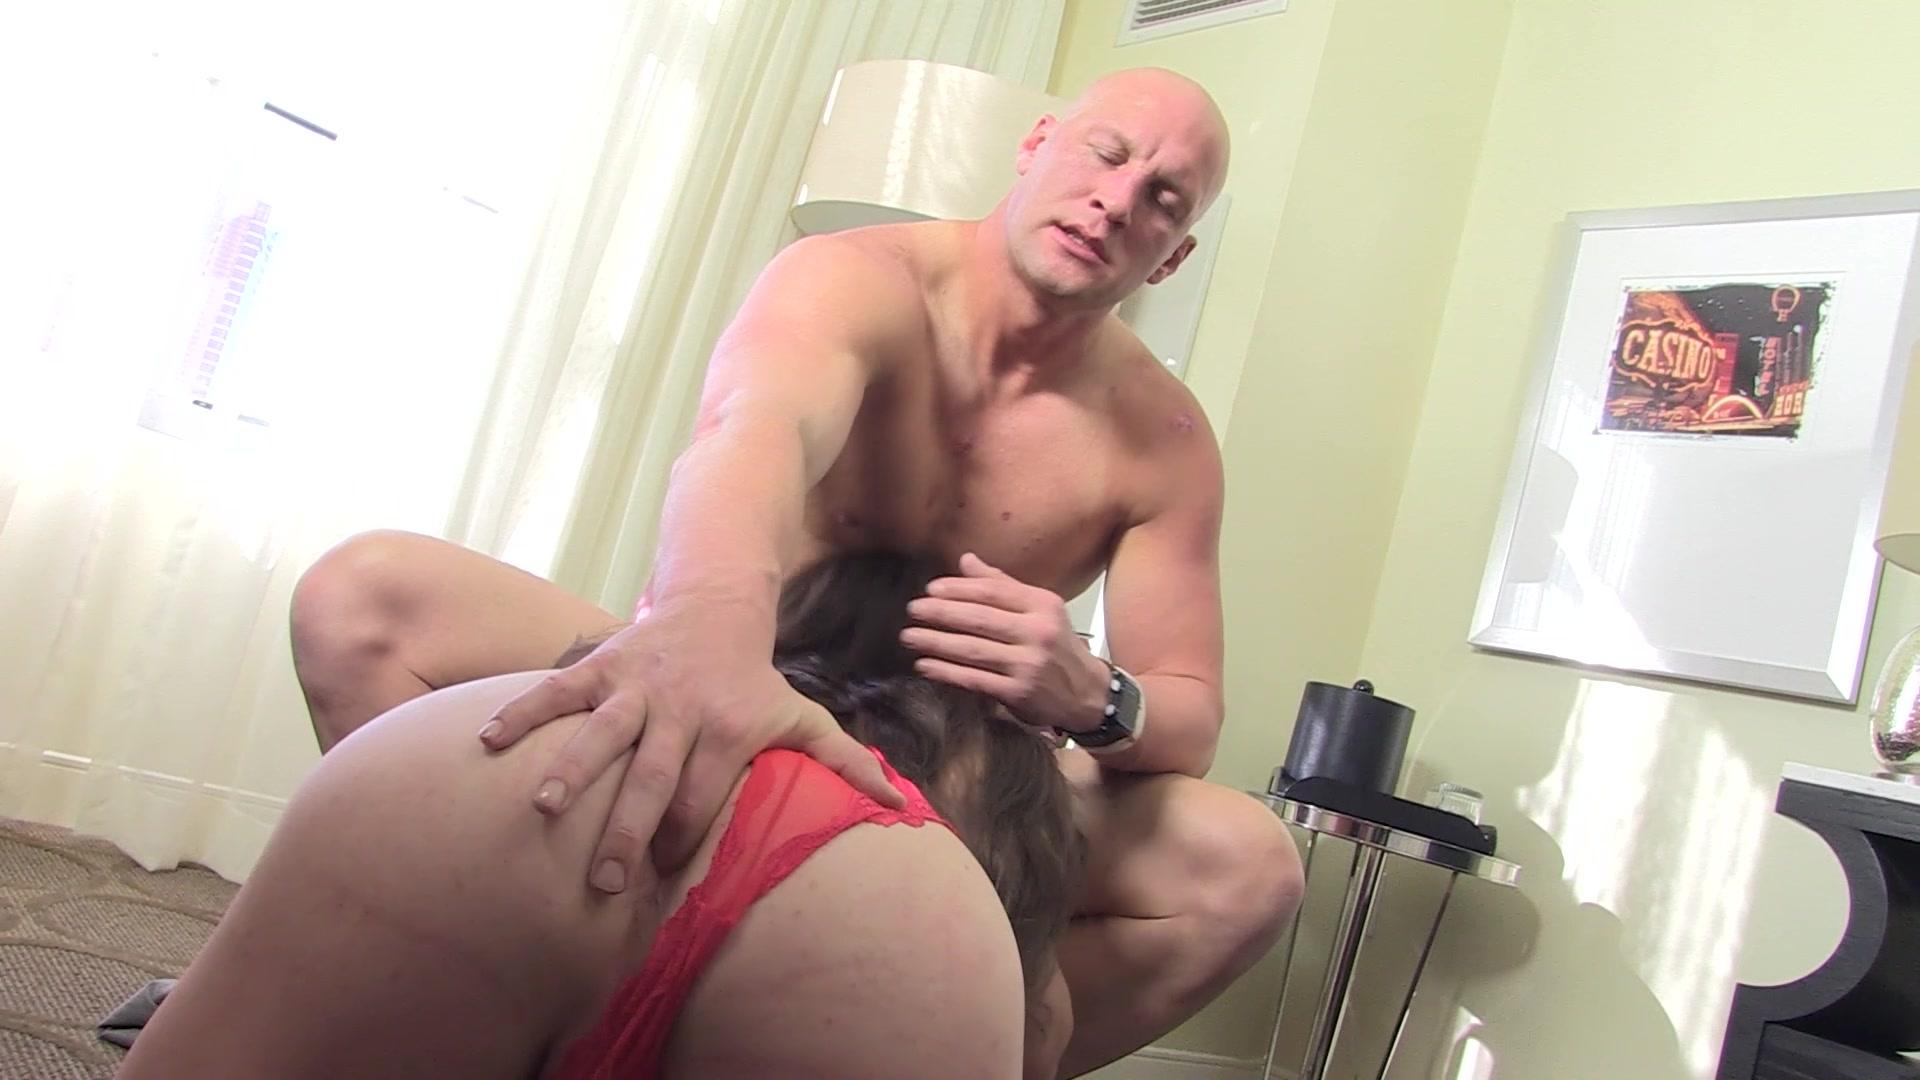 Crossdresser Sex Free Stream Video 50